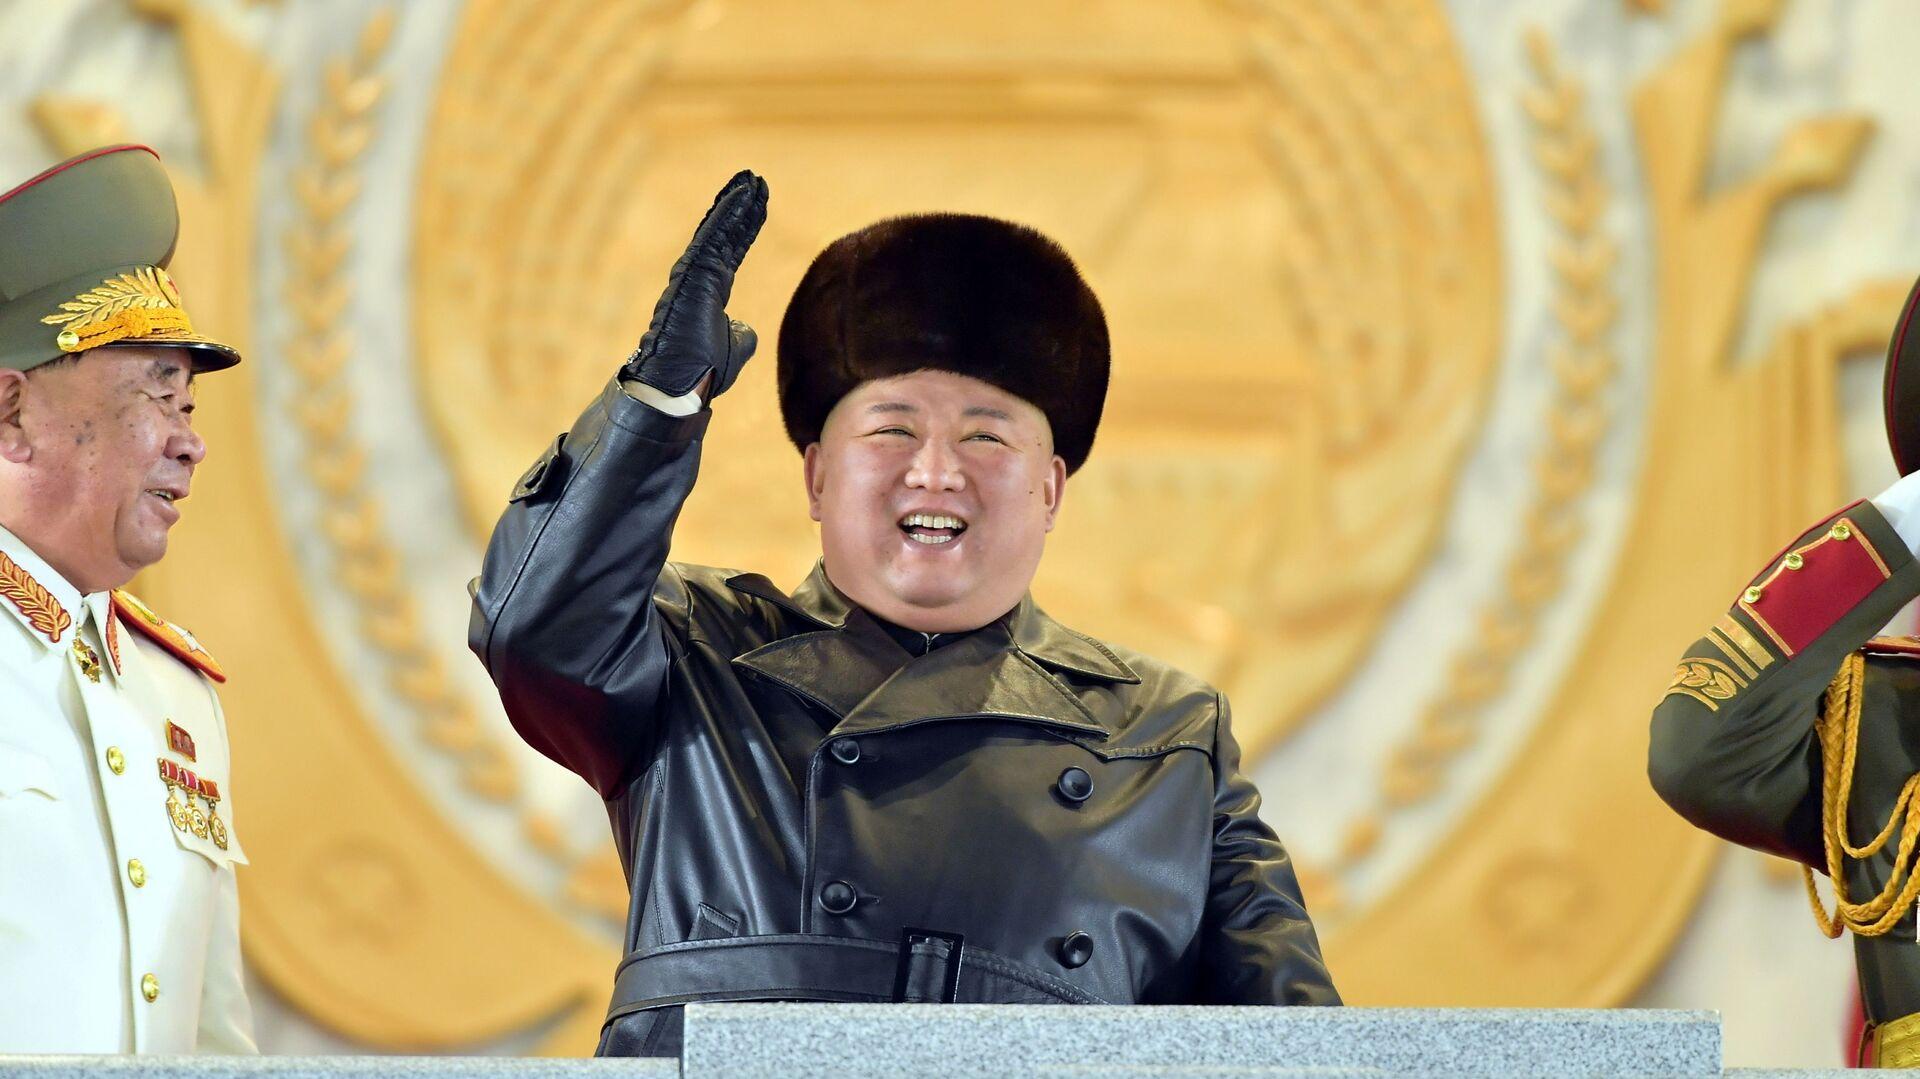 Kim Jong-un, líder de Corea del Norte - Sputnik Mundo, 1920, 12.09.2021